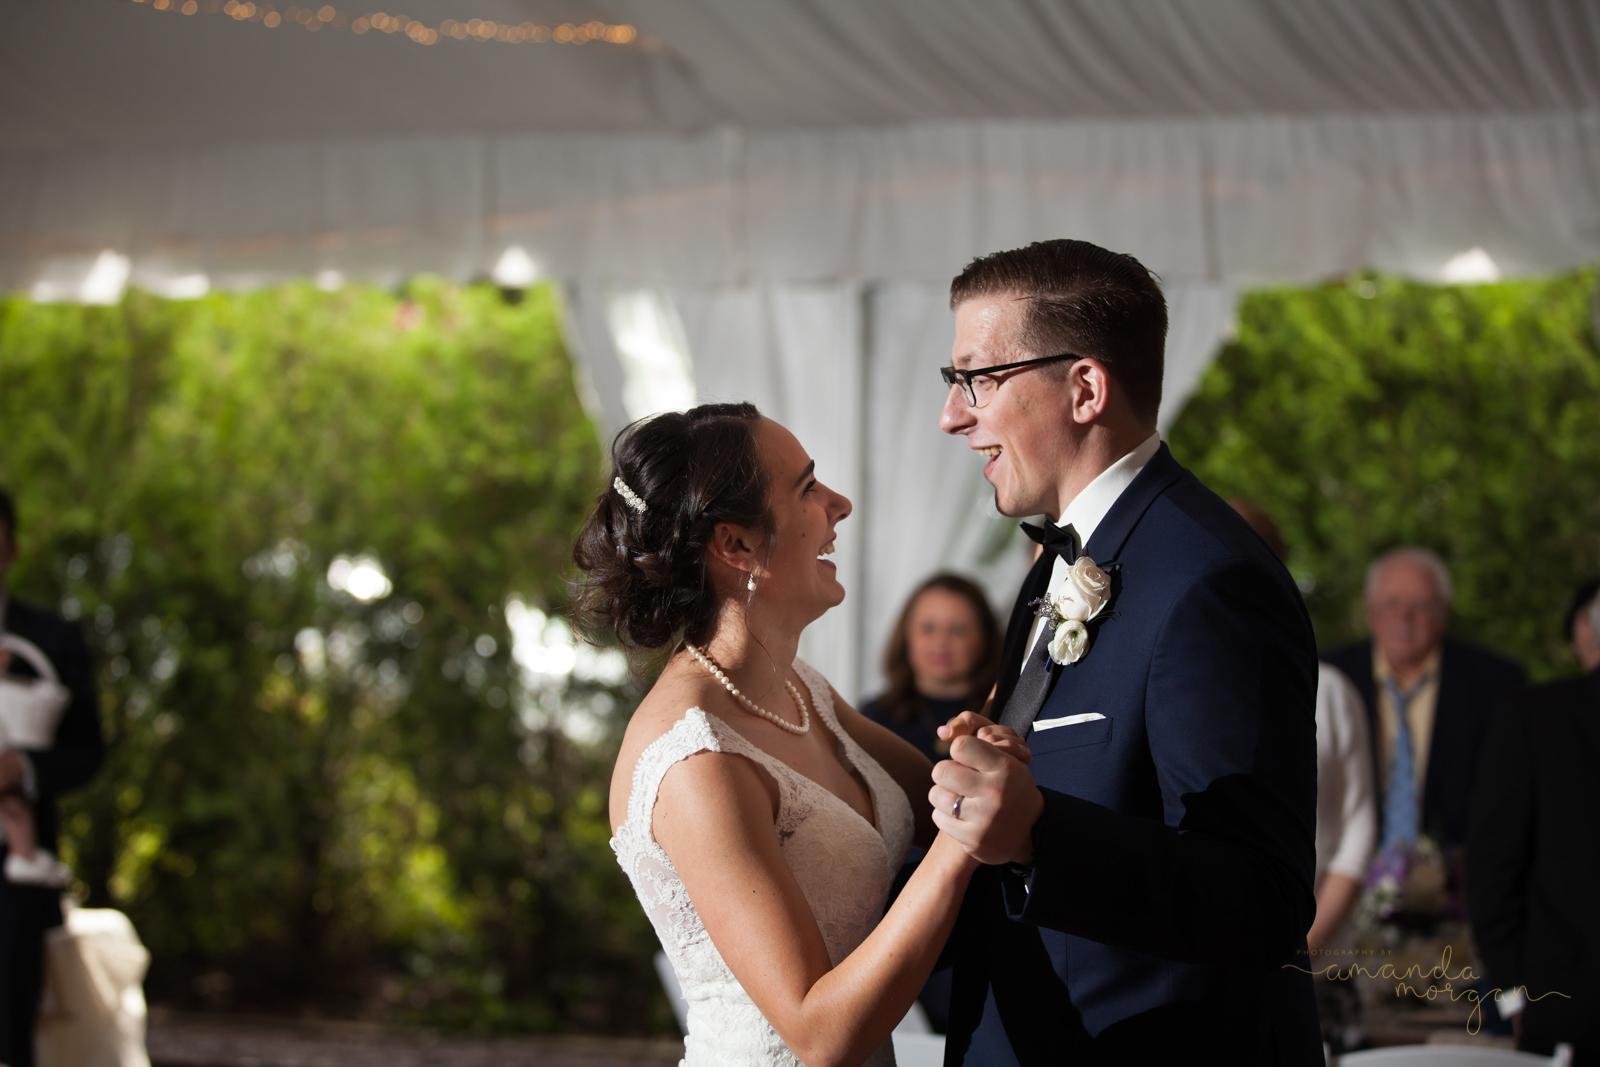 Publick-House-Wedding-Amanda-Morgan-55.jpg